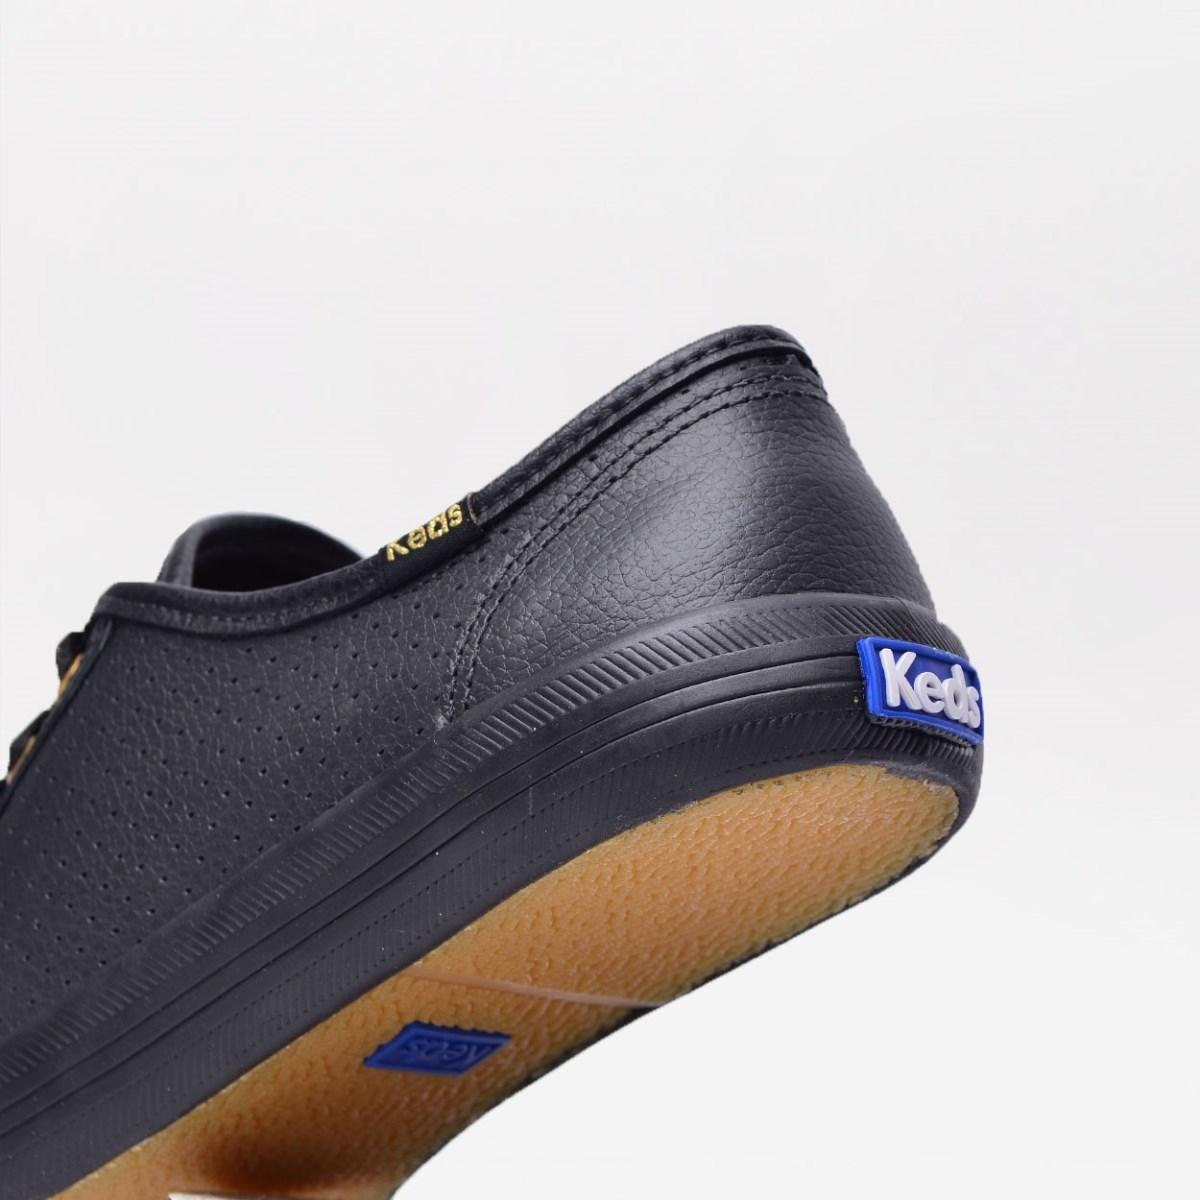 Tênis Keds Kickstart Perf Leather Preto KD810001